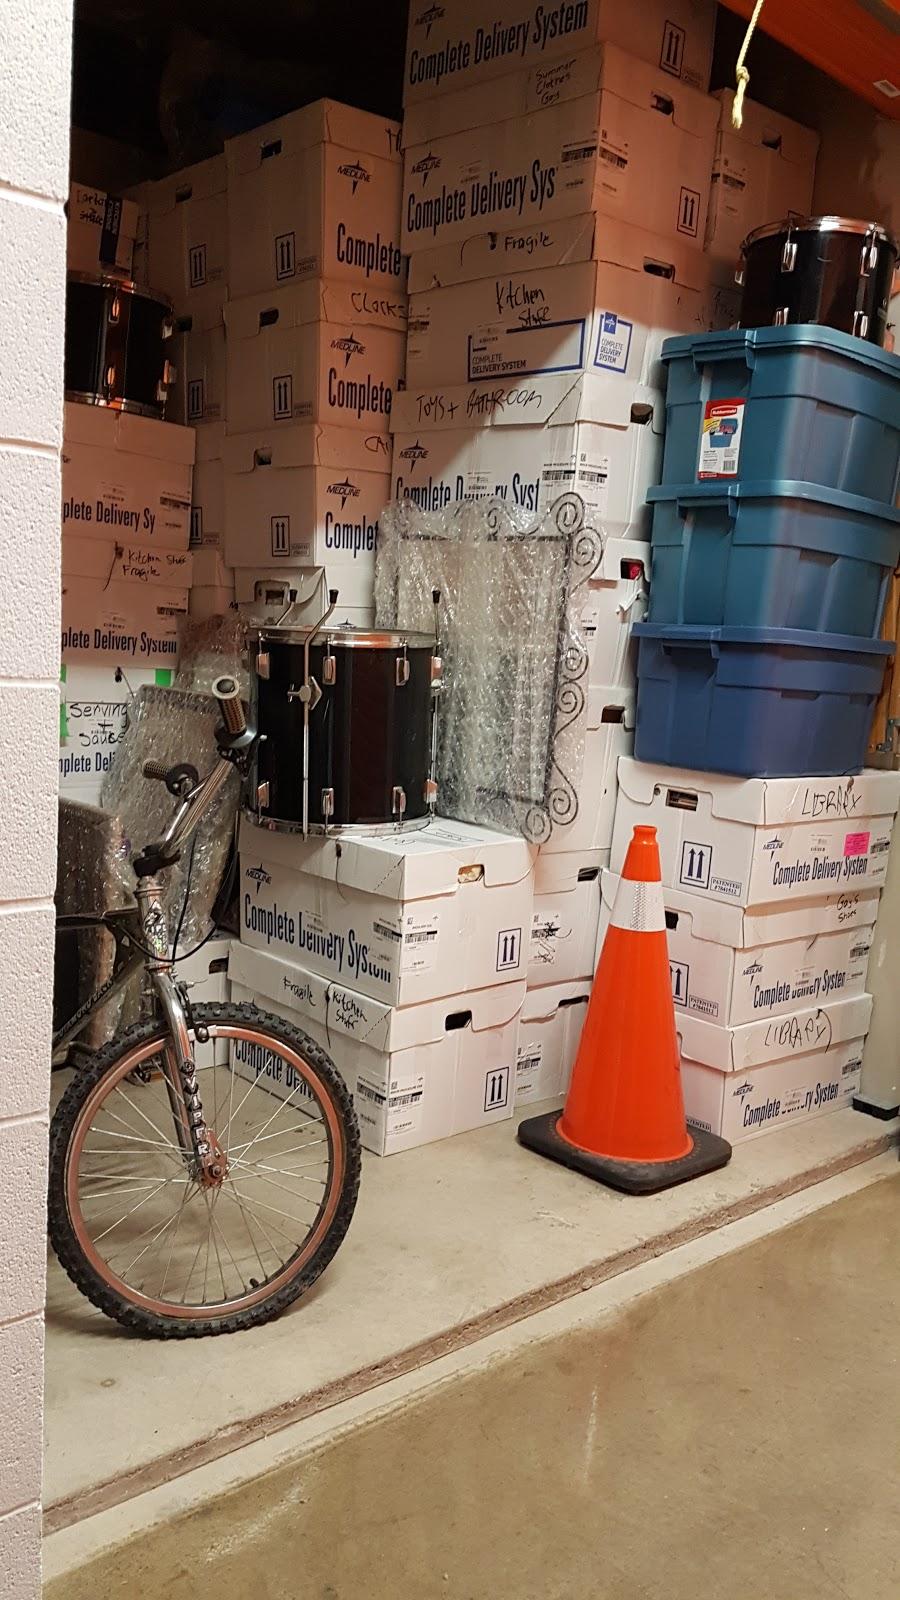 U-Haul Moving & Storage at Fairway Rd | storage | 555 Fairway Rd S, Kitchener, ON N2C 1X4, Canada | 5198932222 OR +1 519-893-2222